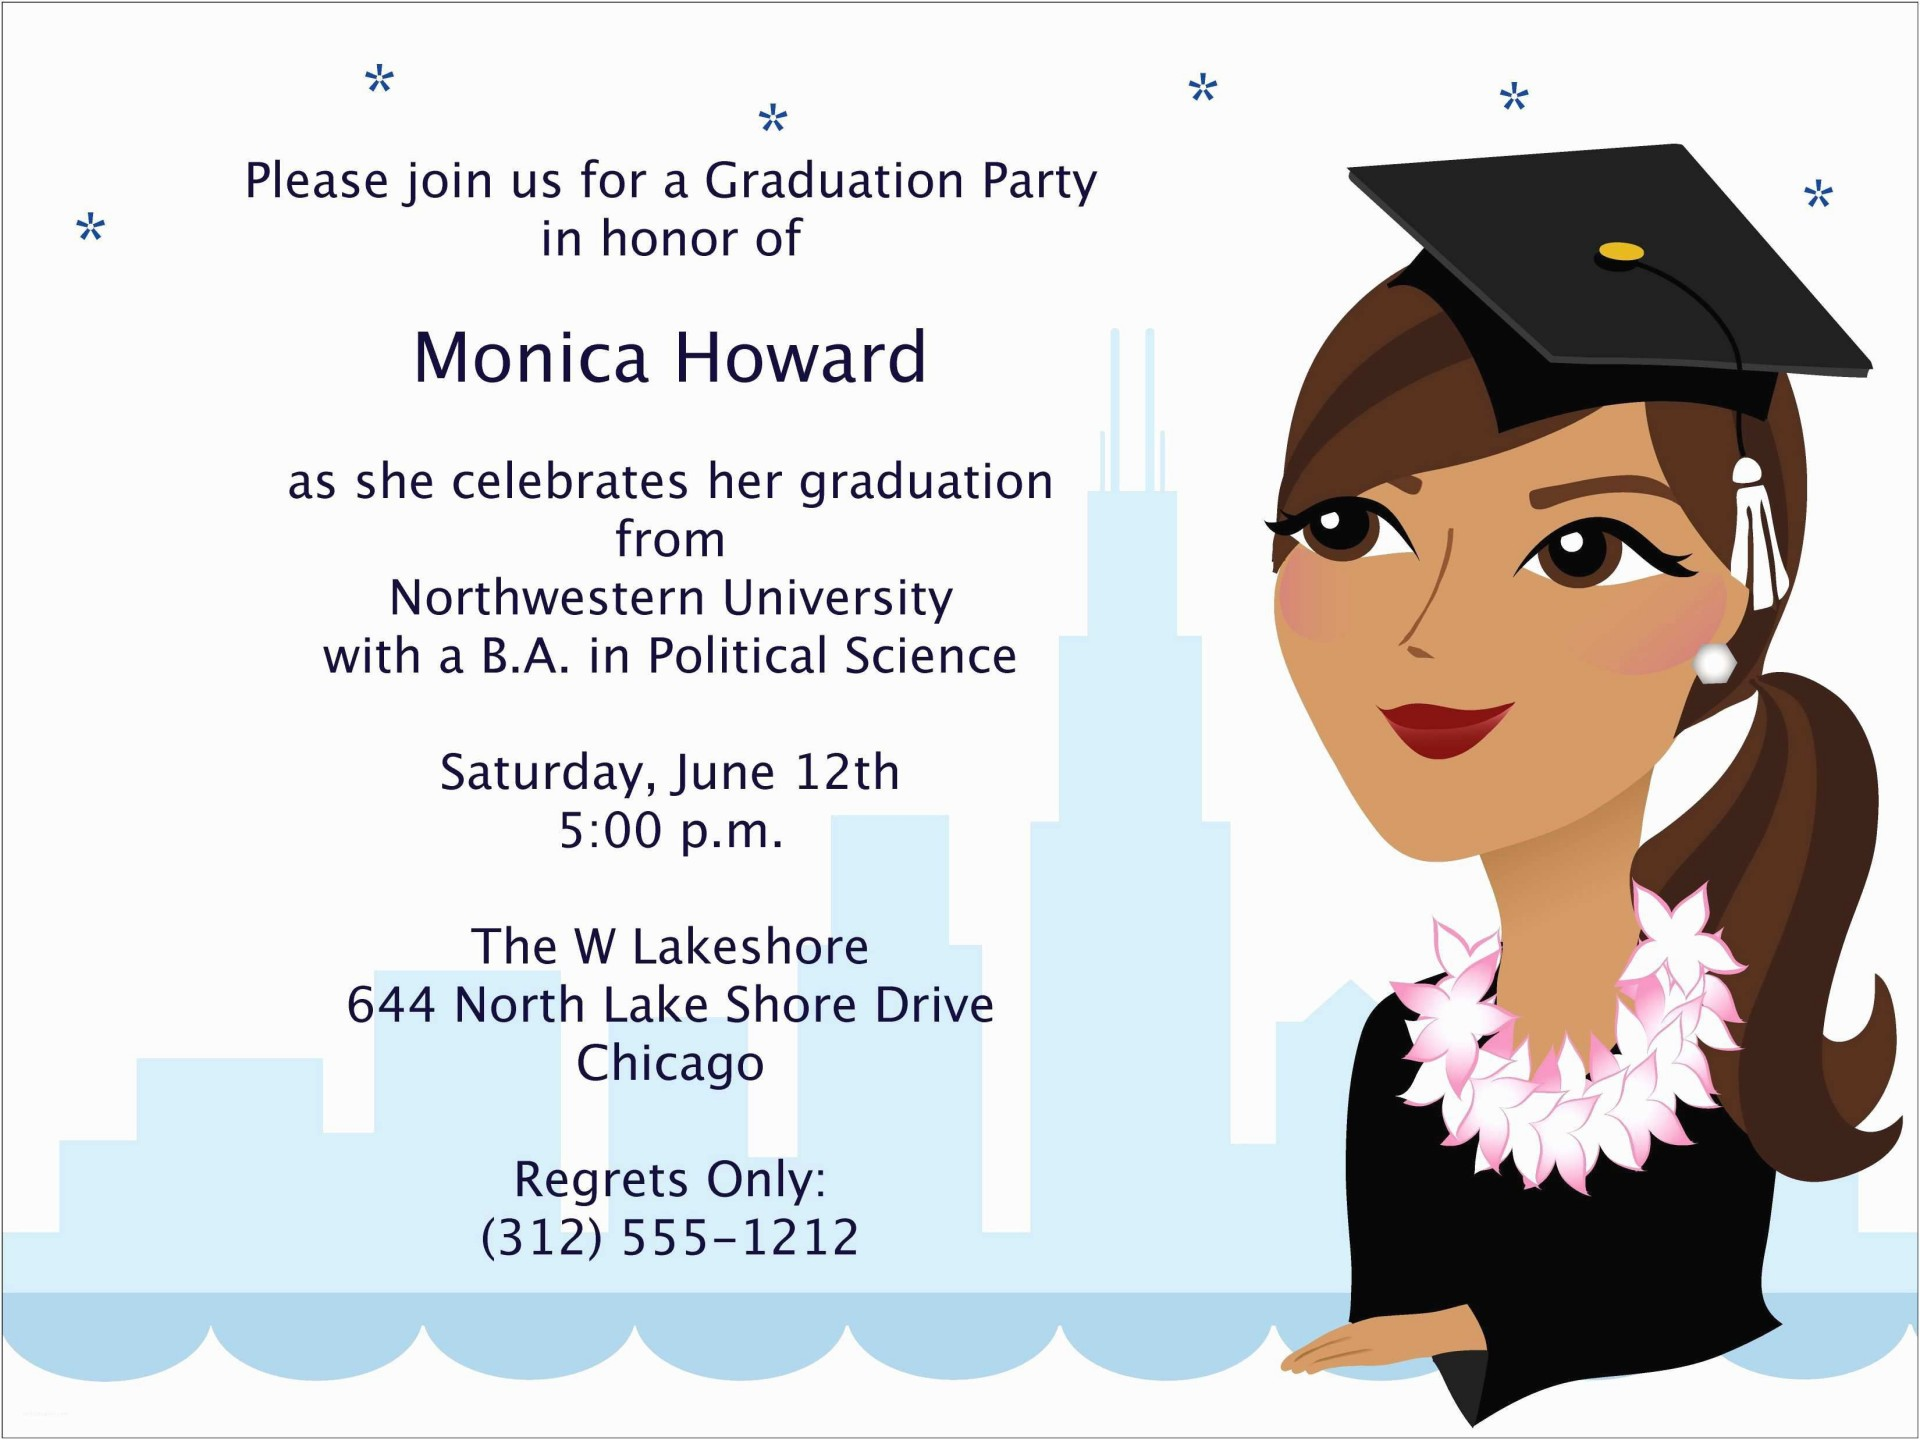 002 Wondrou College Graduation Party Invitation Template High Definition  Templates1920